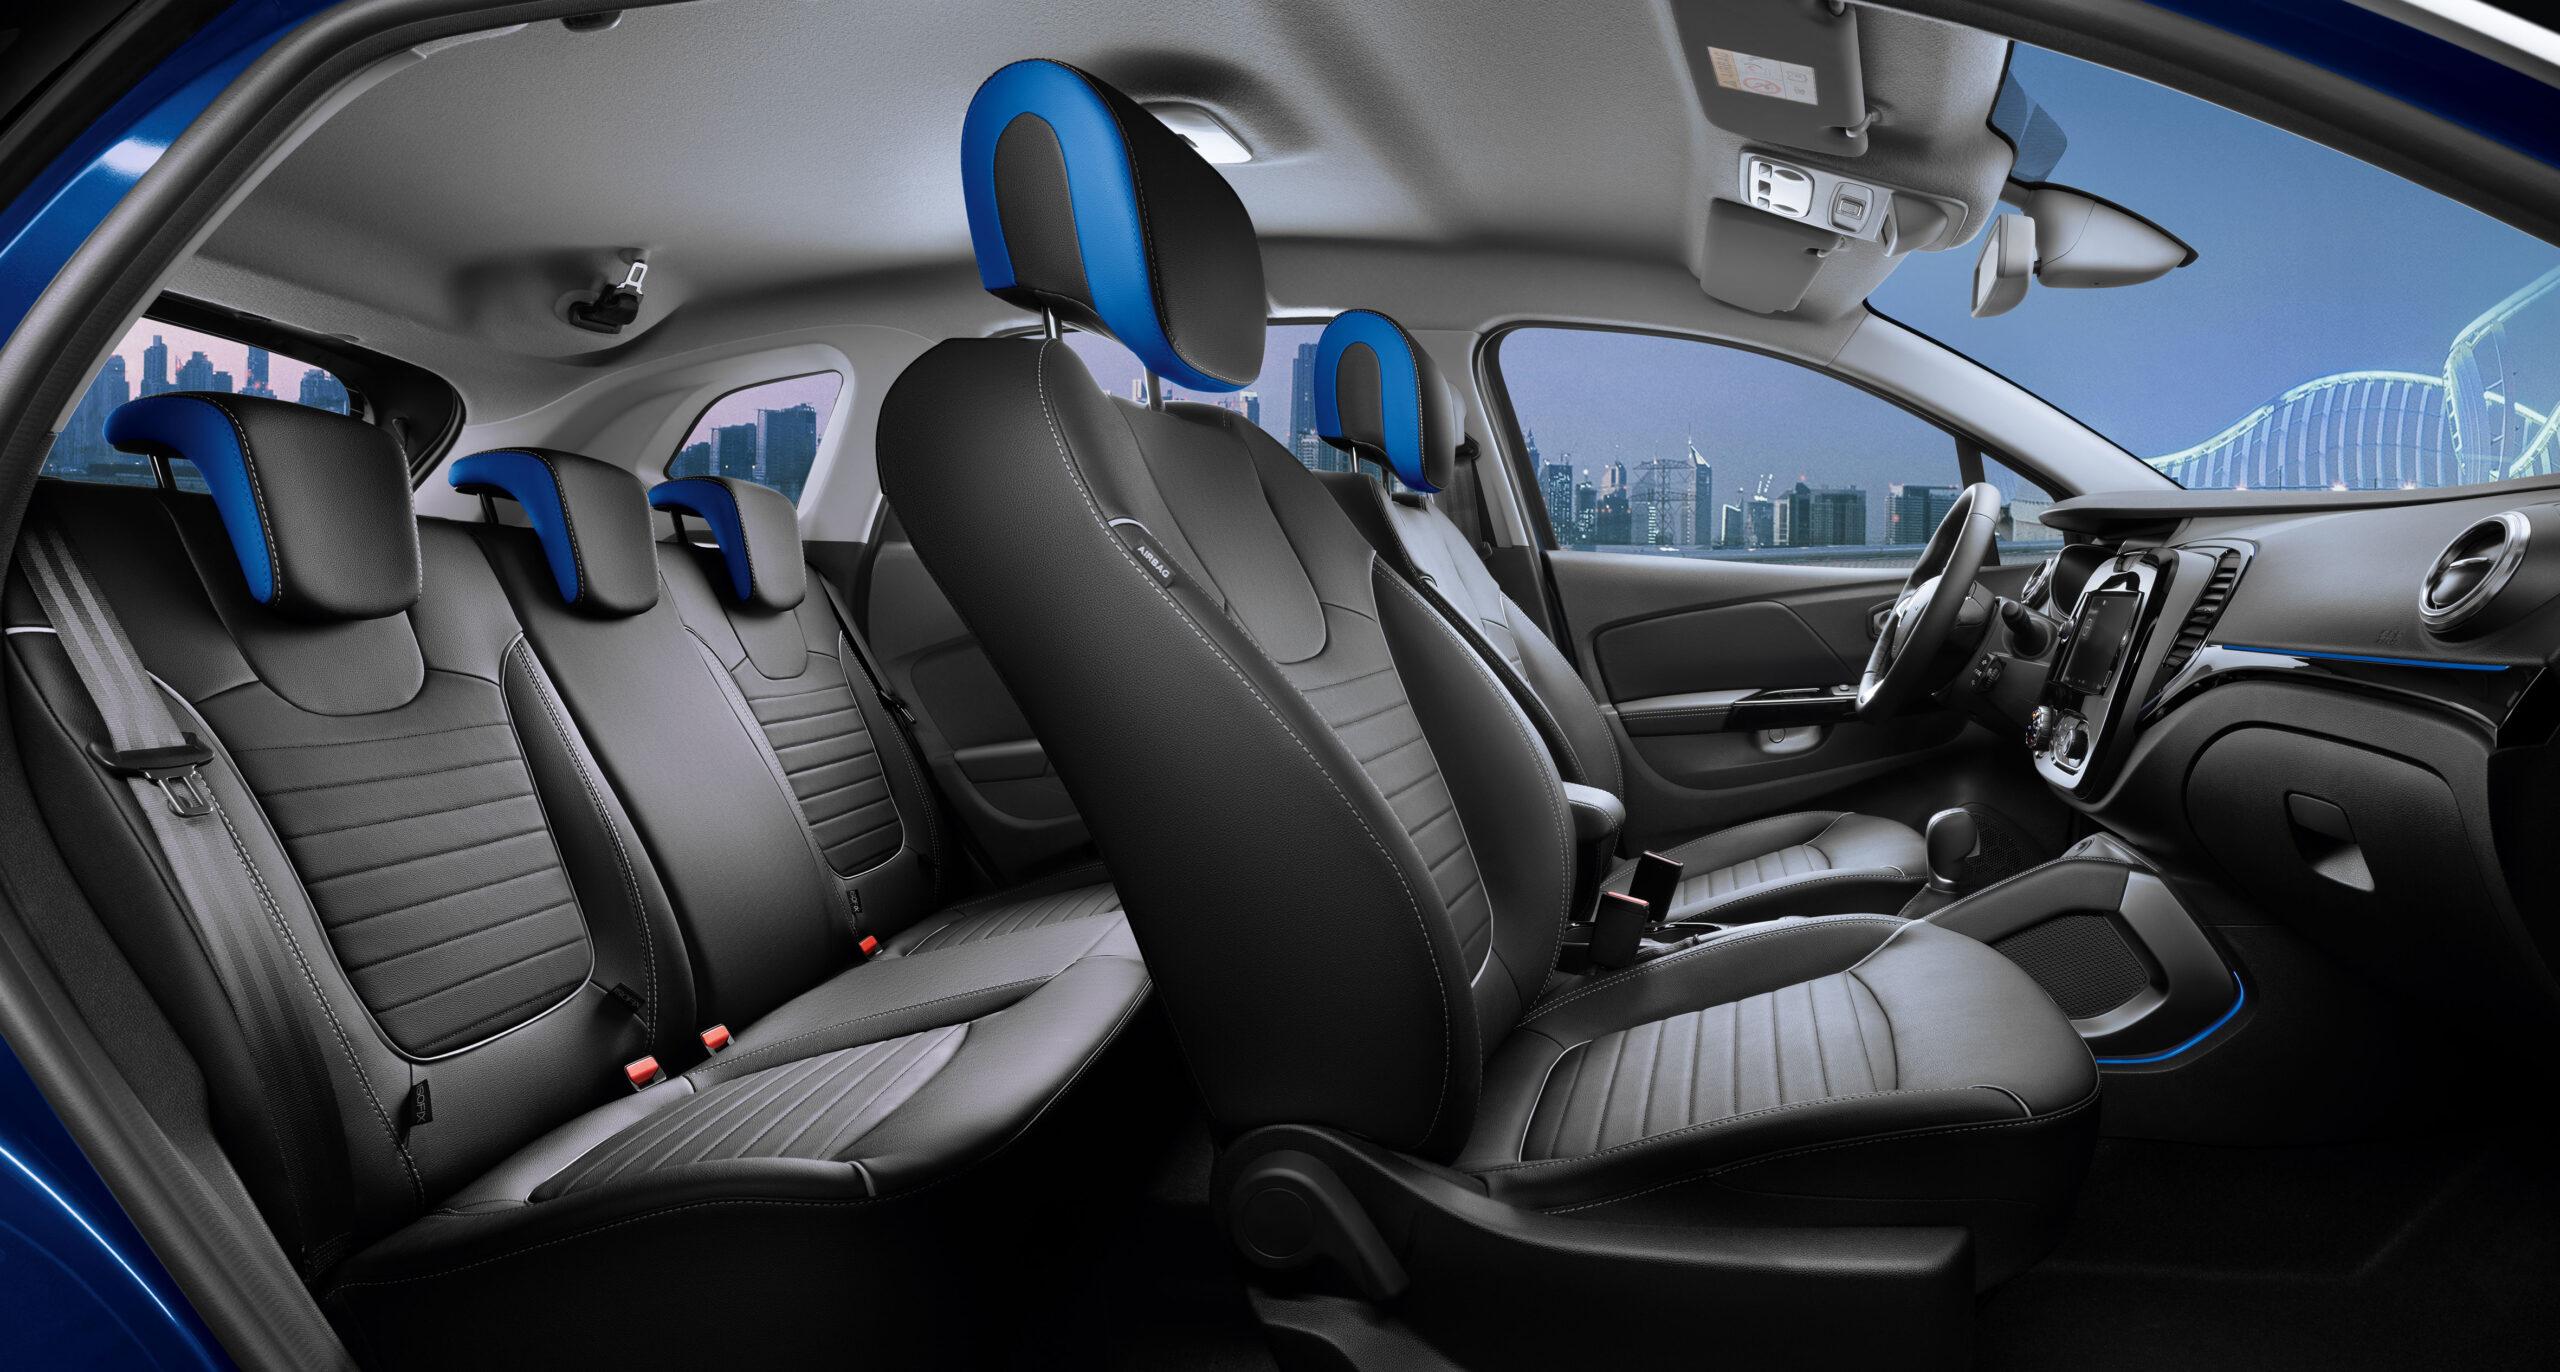 Интерьер Renault Kaptur. Фото Renault